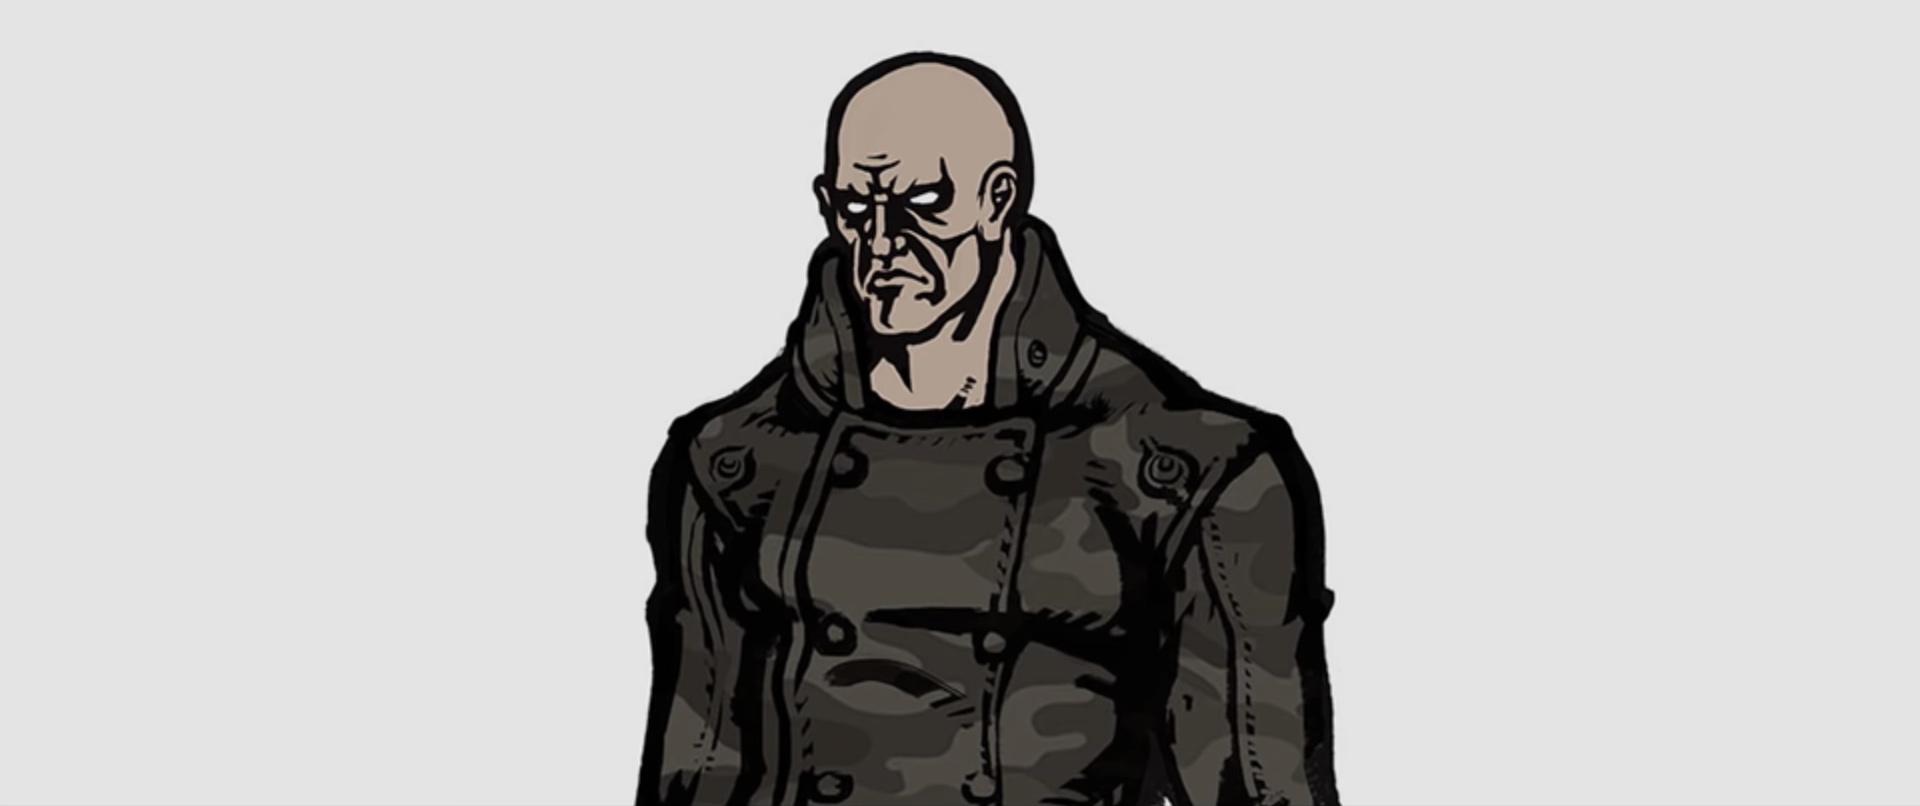 Resident Evil 2 early Tyrant design